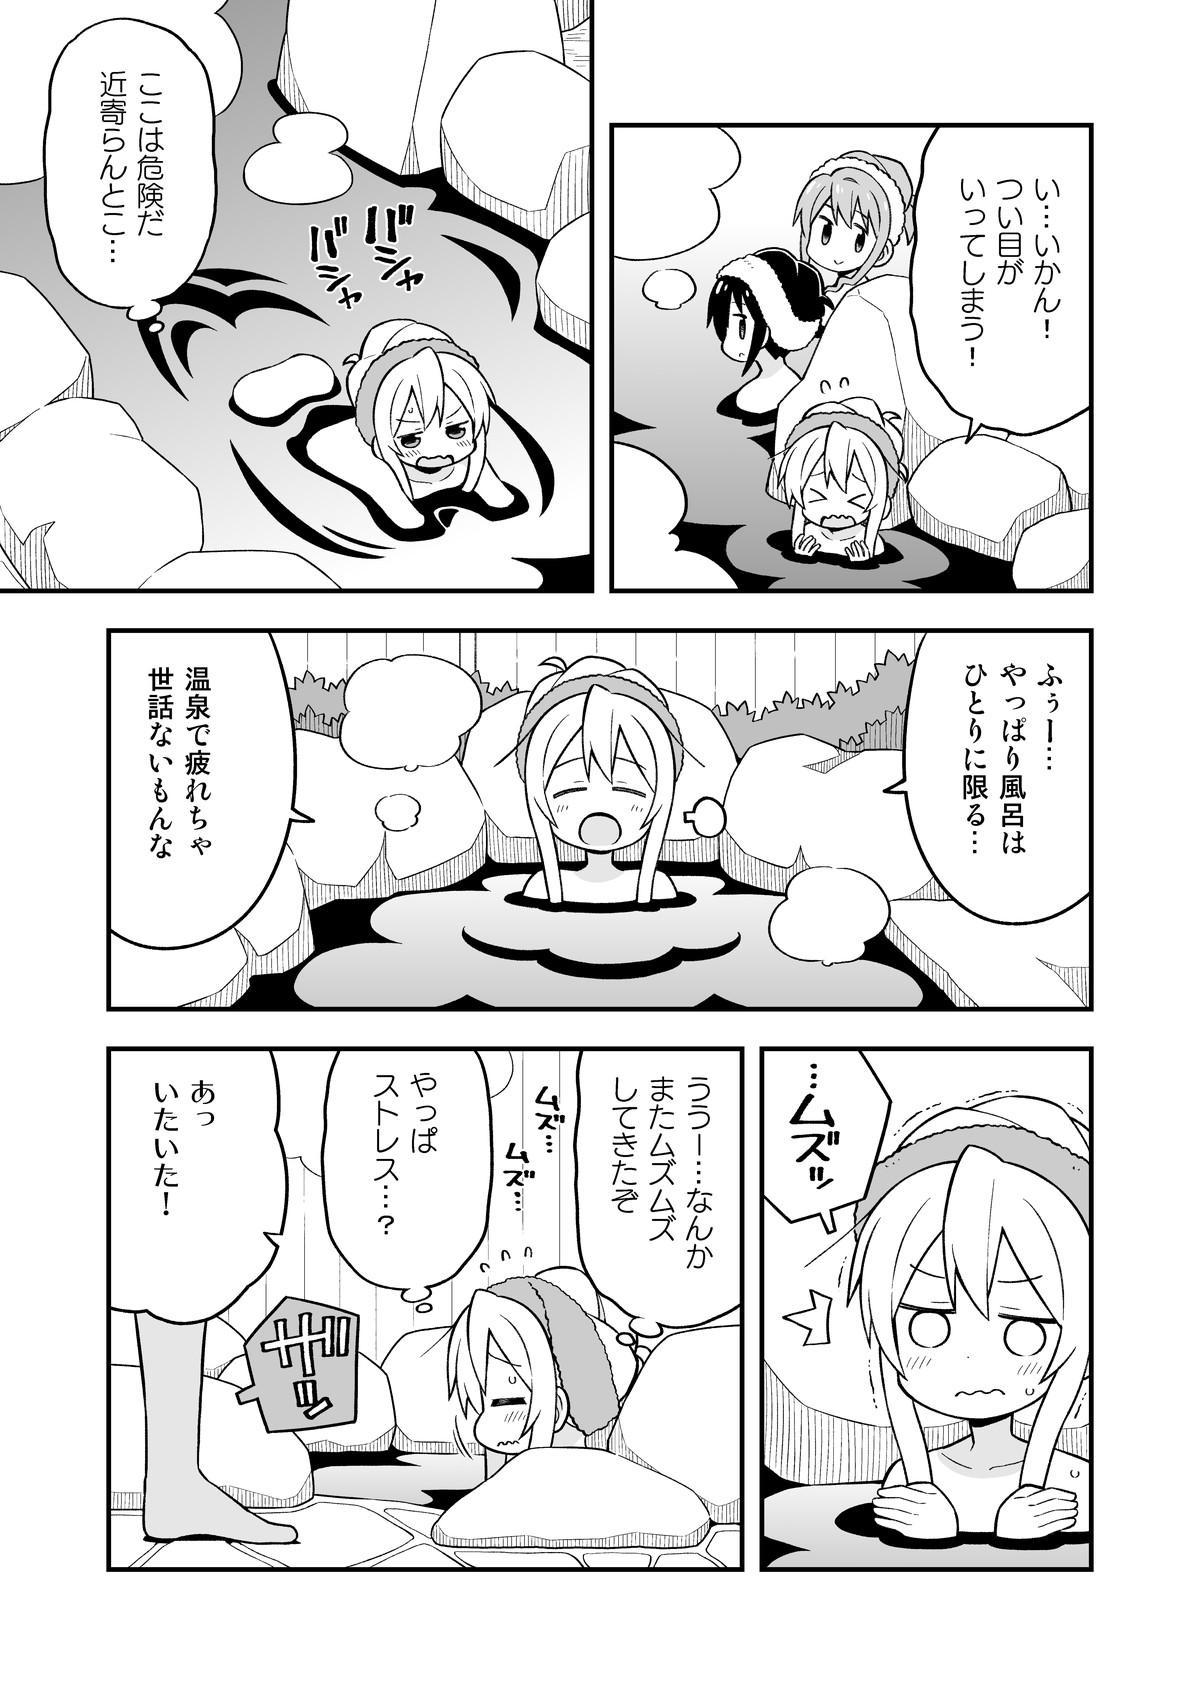 Onii-chan wa Oshimai! 6 23